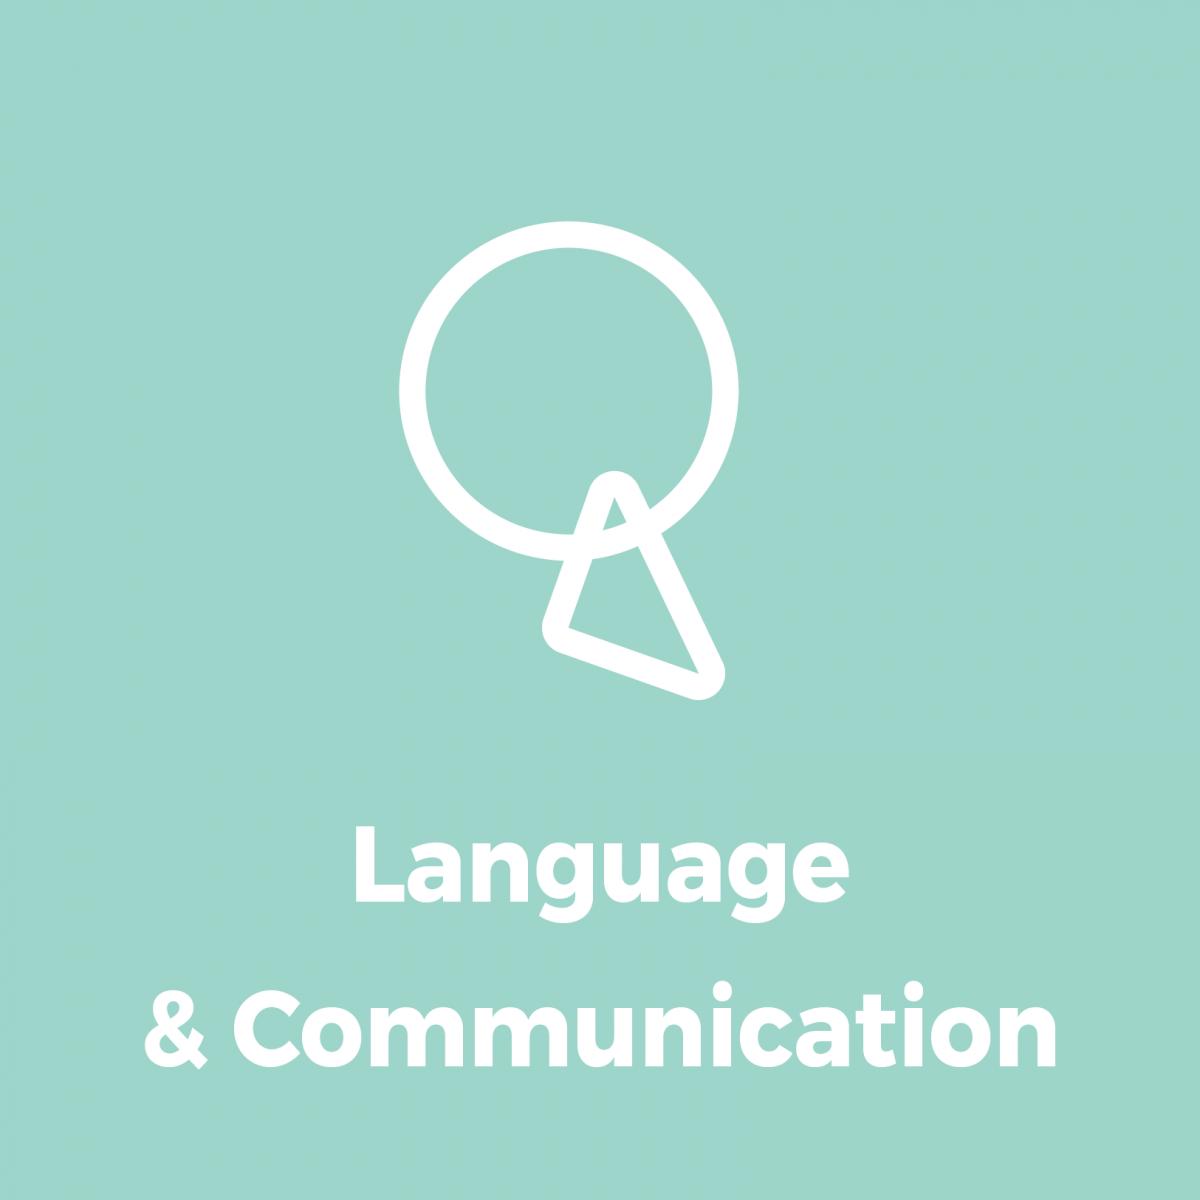 YMC_Identification_LanguageCommunication